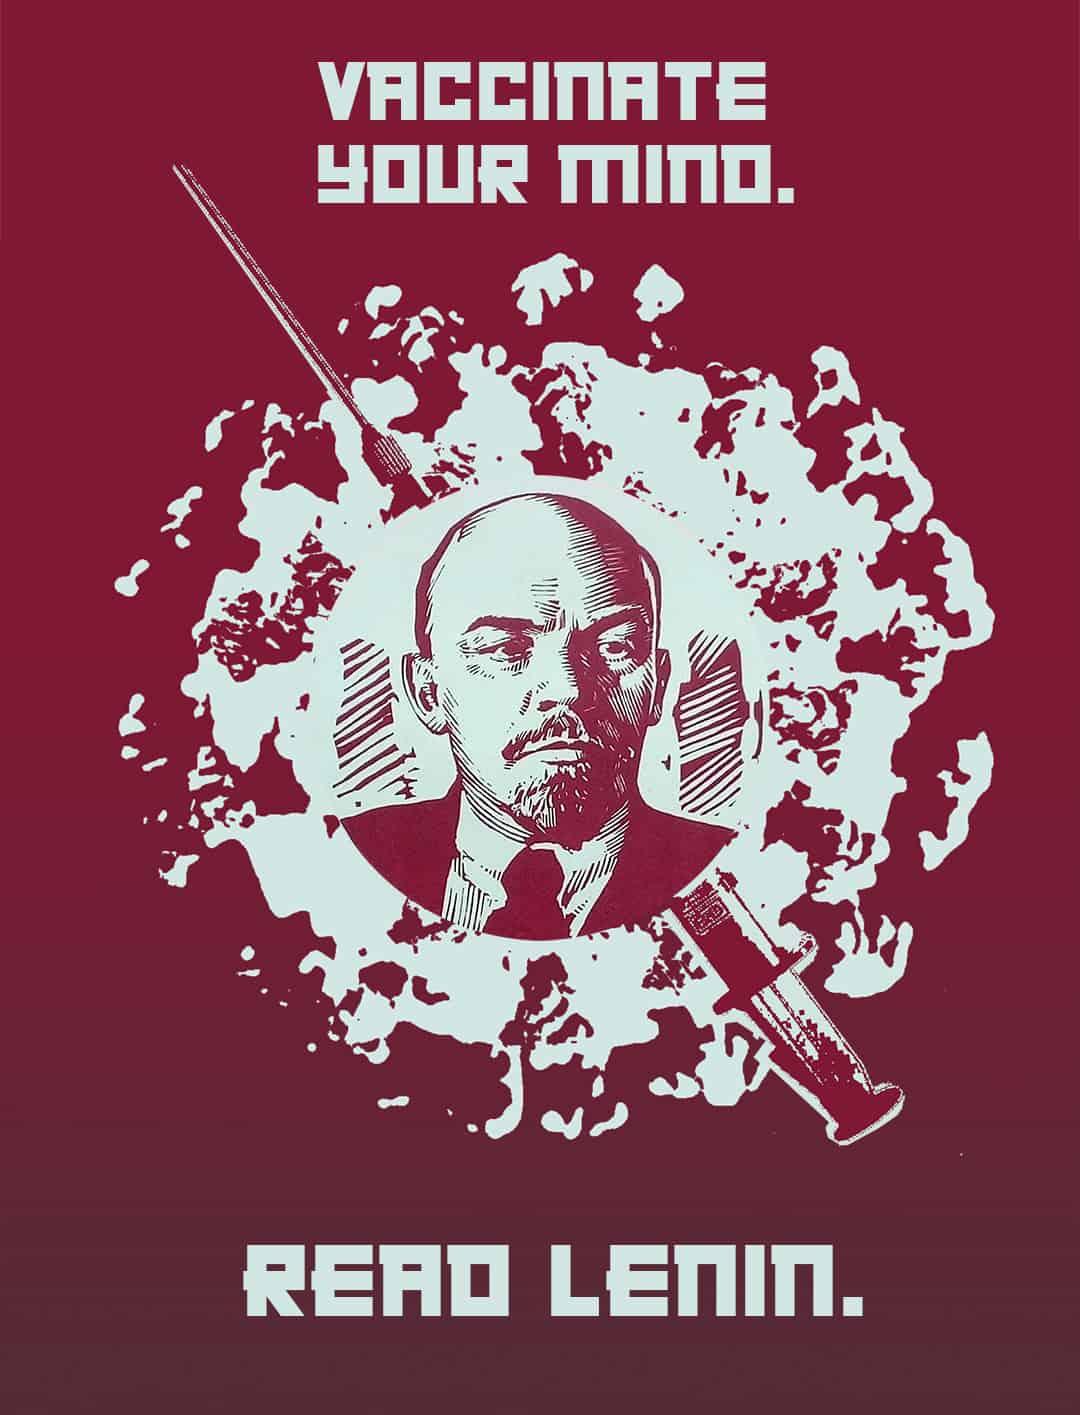 vaccinate your mind, read Lenin meme